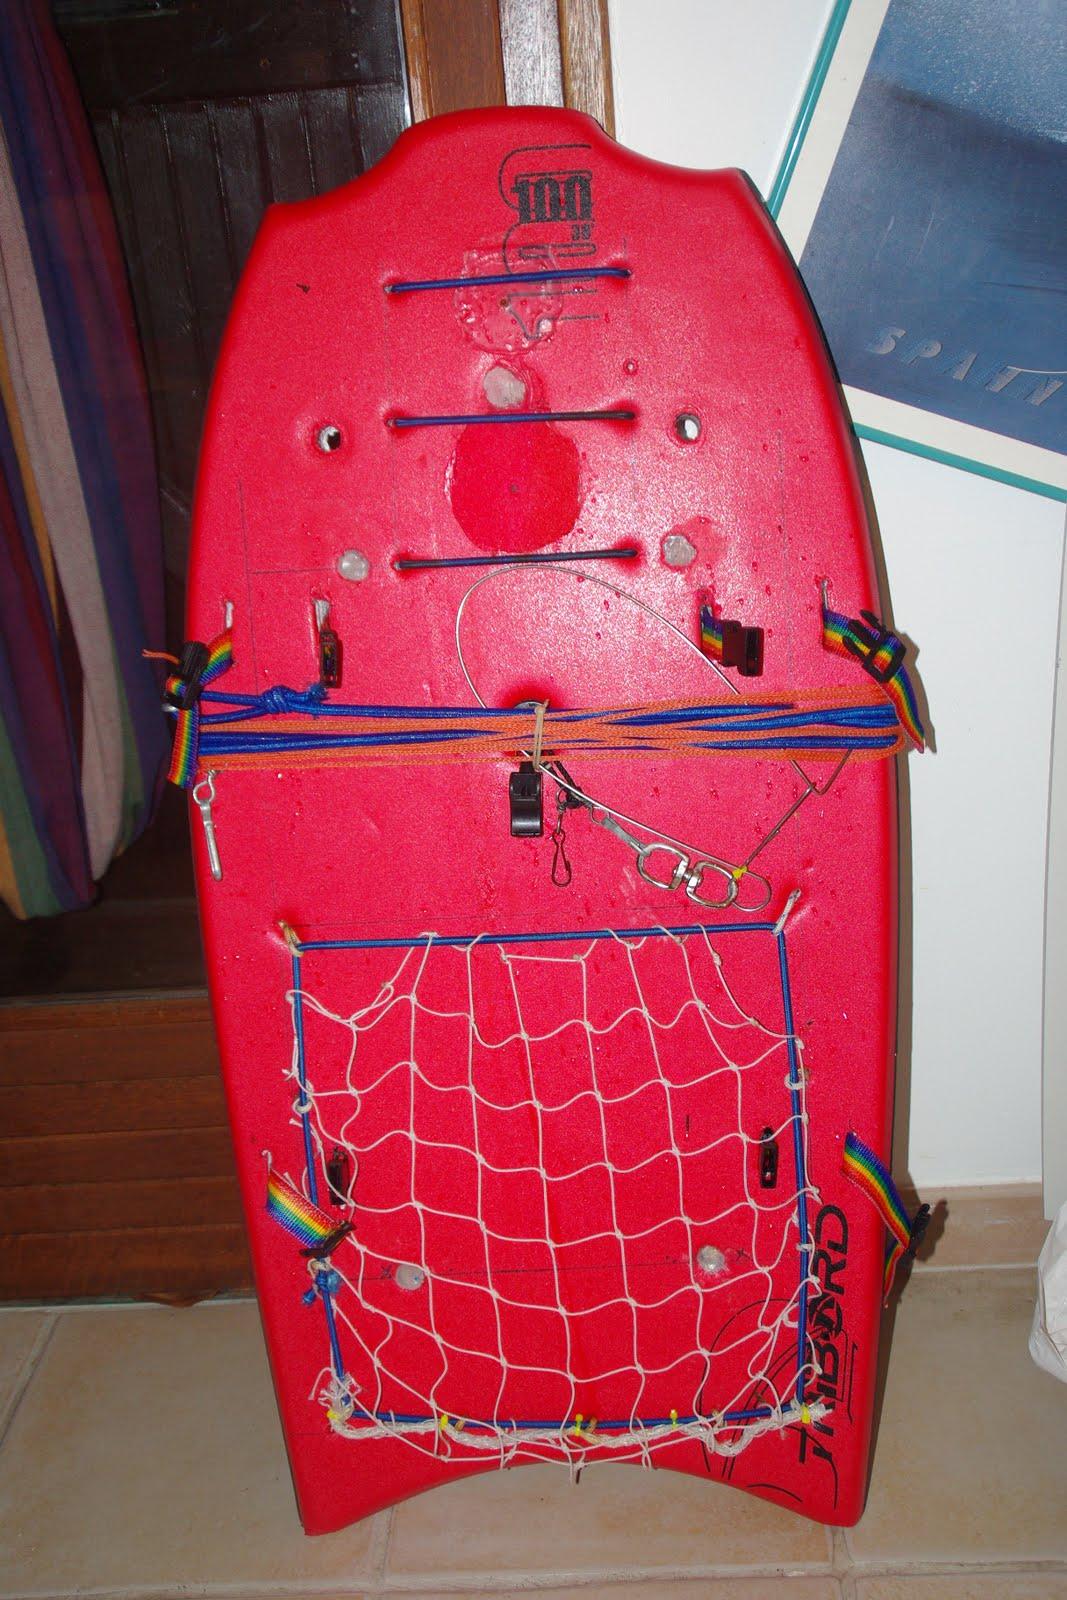 chasse sous marine by red mor fabrication d 39 une planche partir d 39 un bodyboard. Black Bedroom Furniture Sets. Home Design Ideas